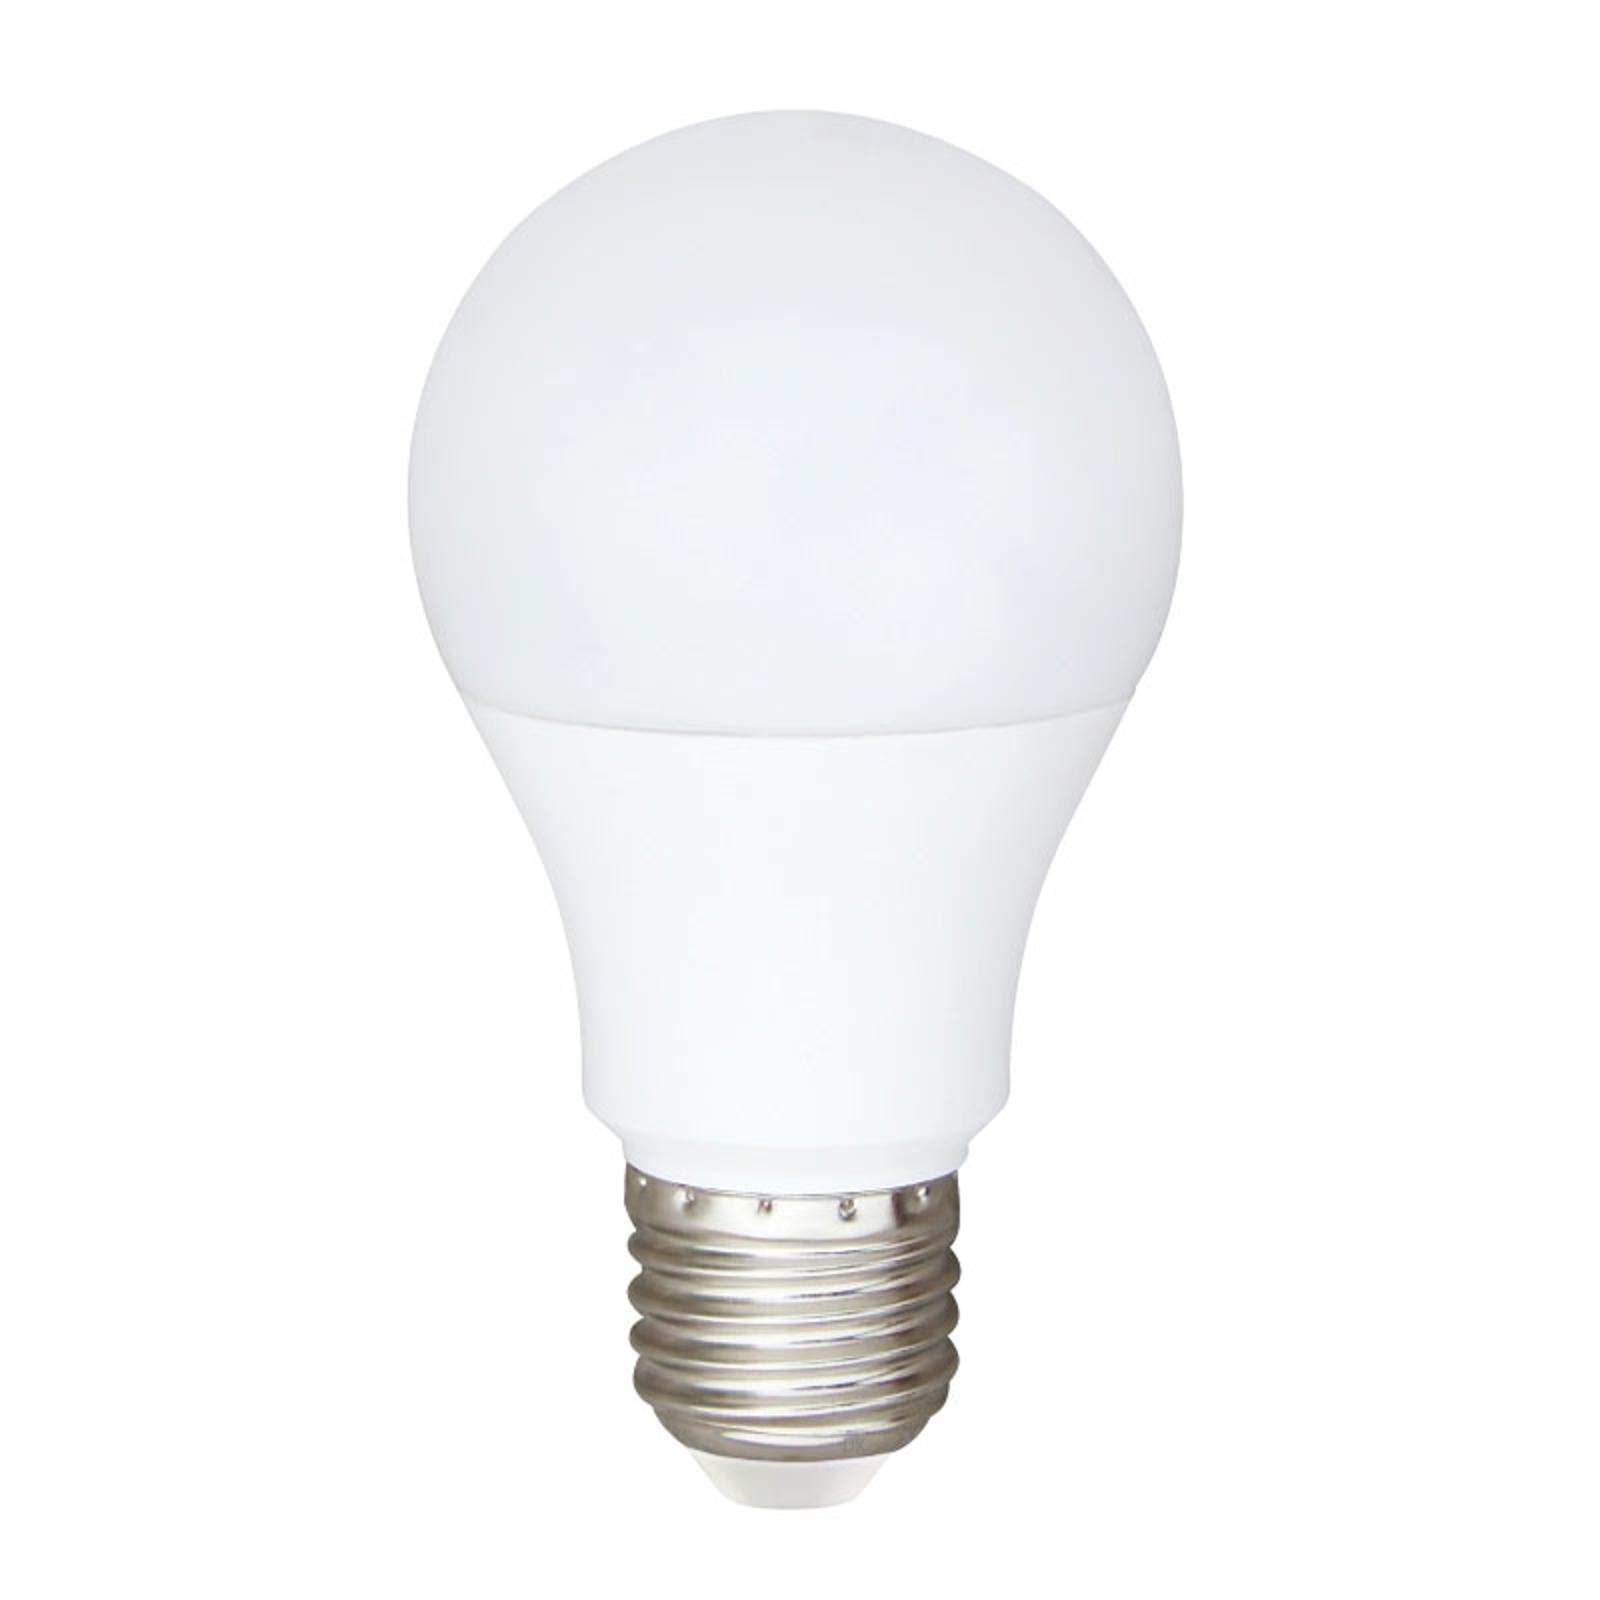 LED žárovka ARAXA E27 9W pro AC a DC, 2 700K